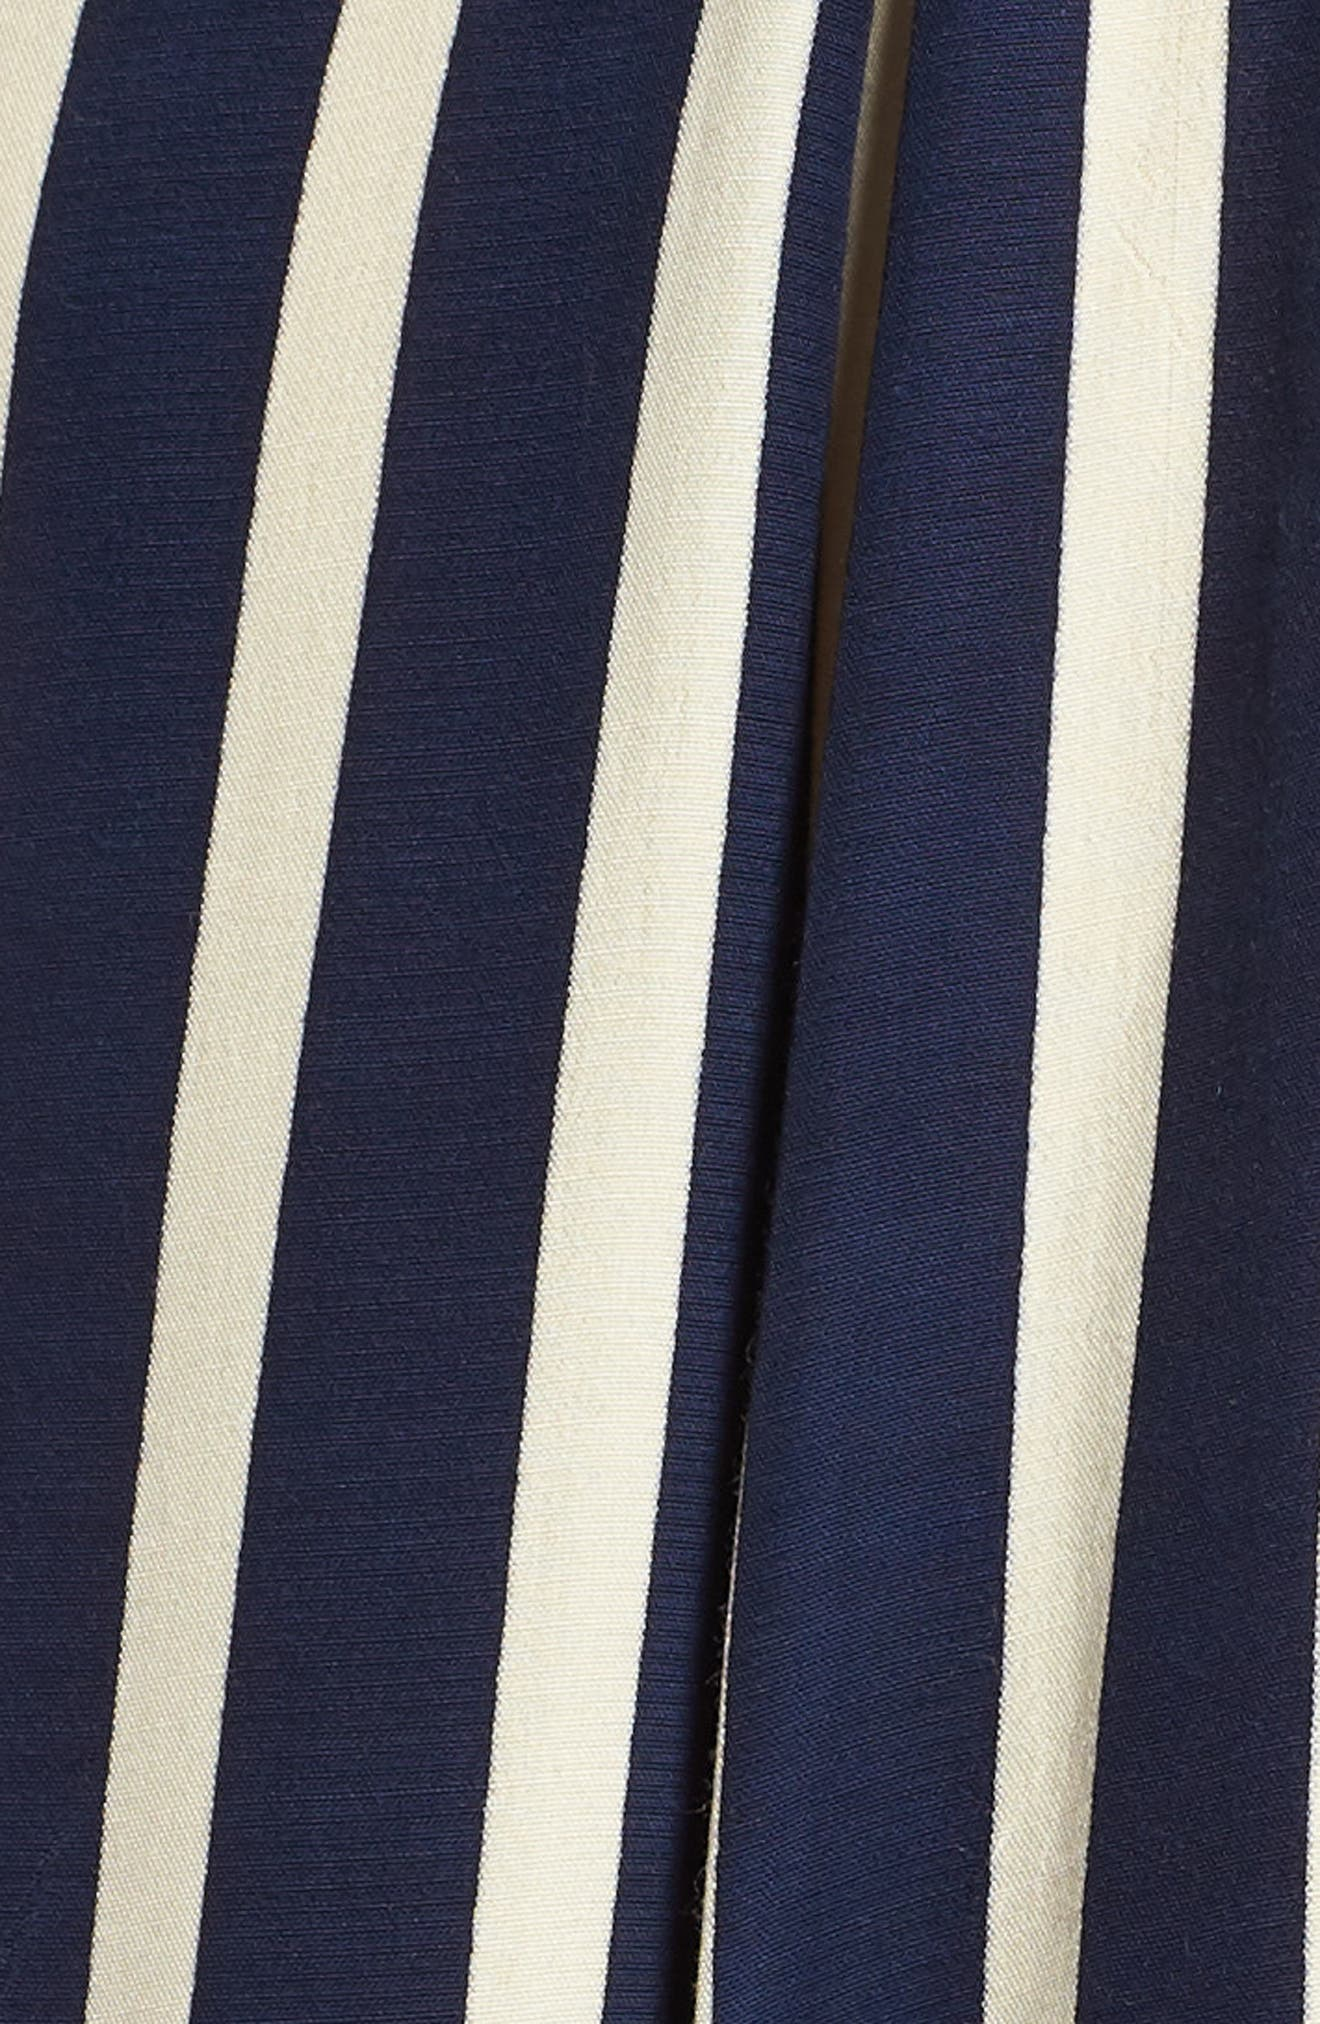 Milan Stripe Midi Dress,                             Alternate thumbnail 5, color,                             Mazur Stripe Print Navy